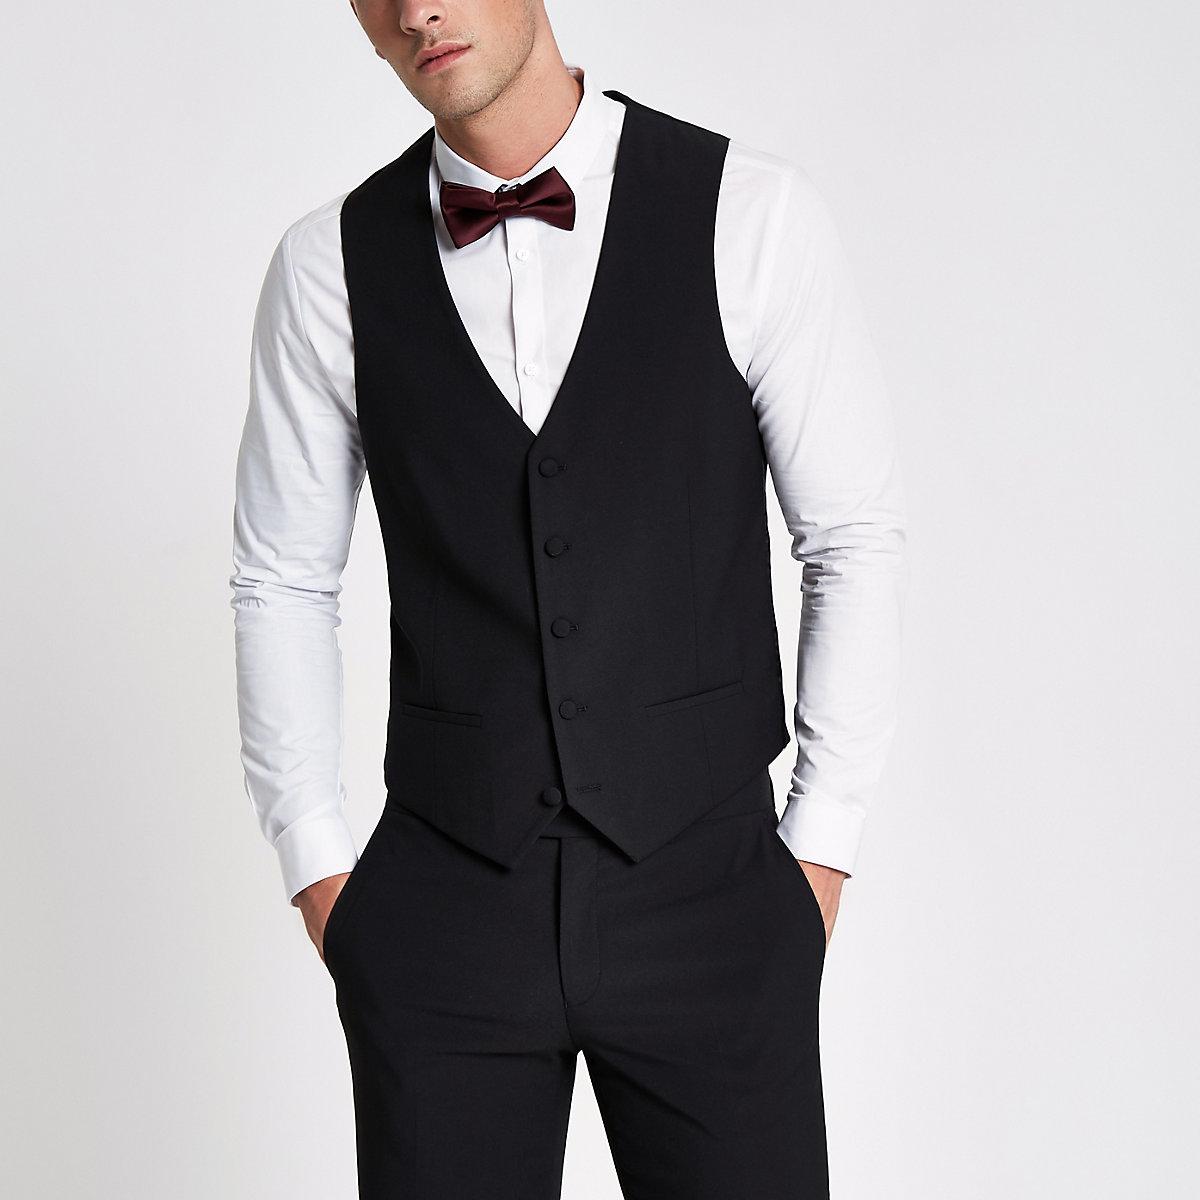 Black suit waistcoat